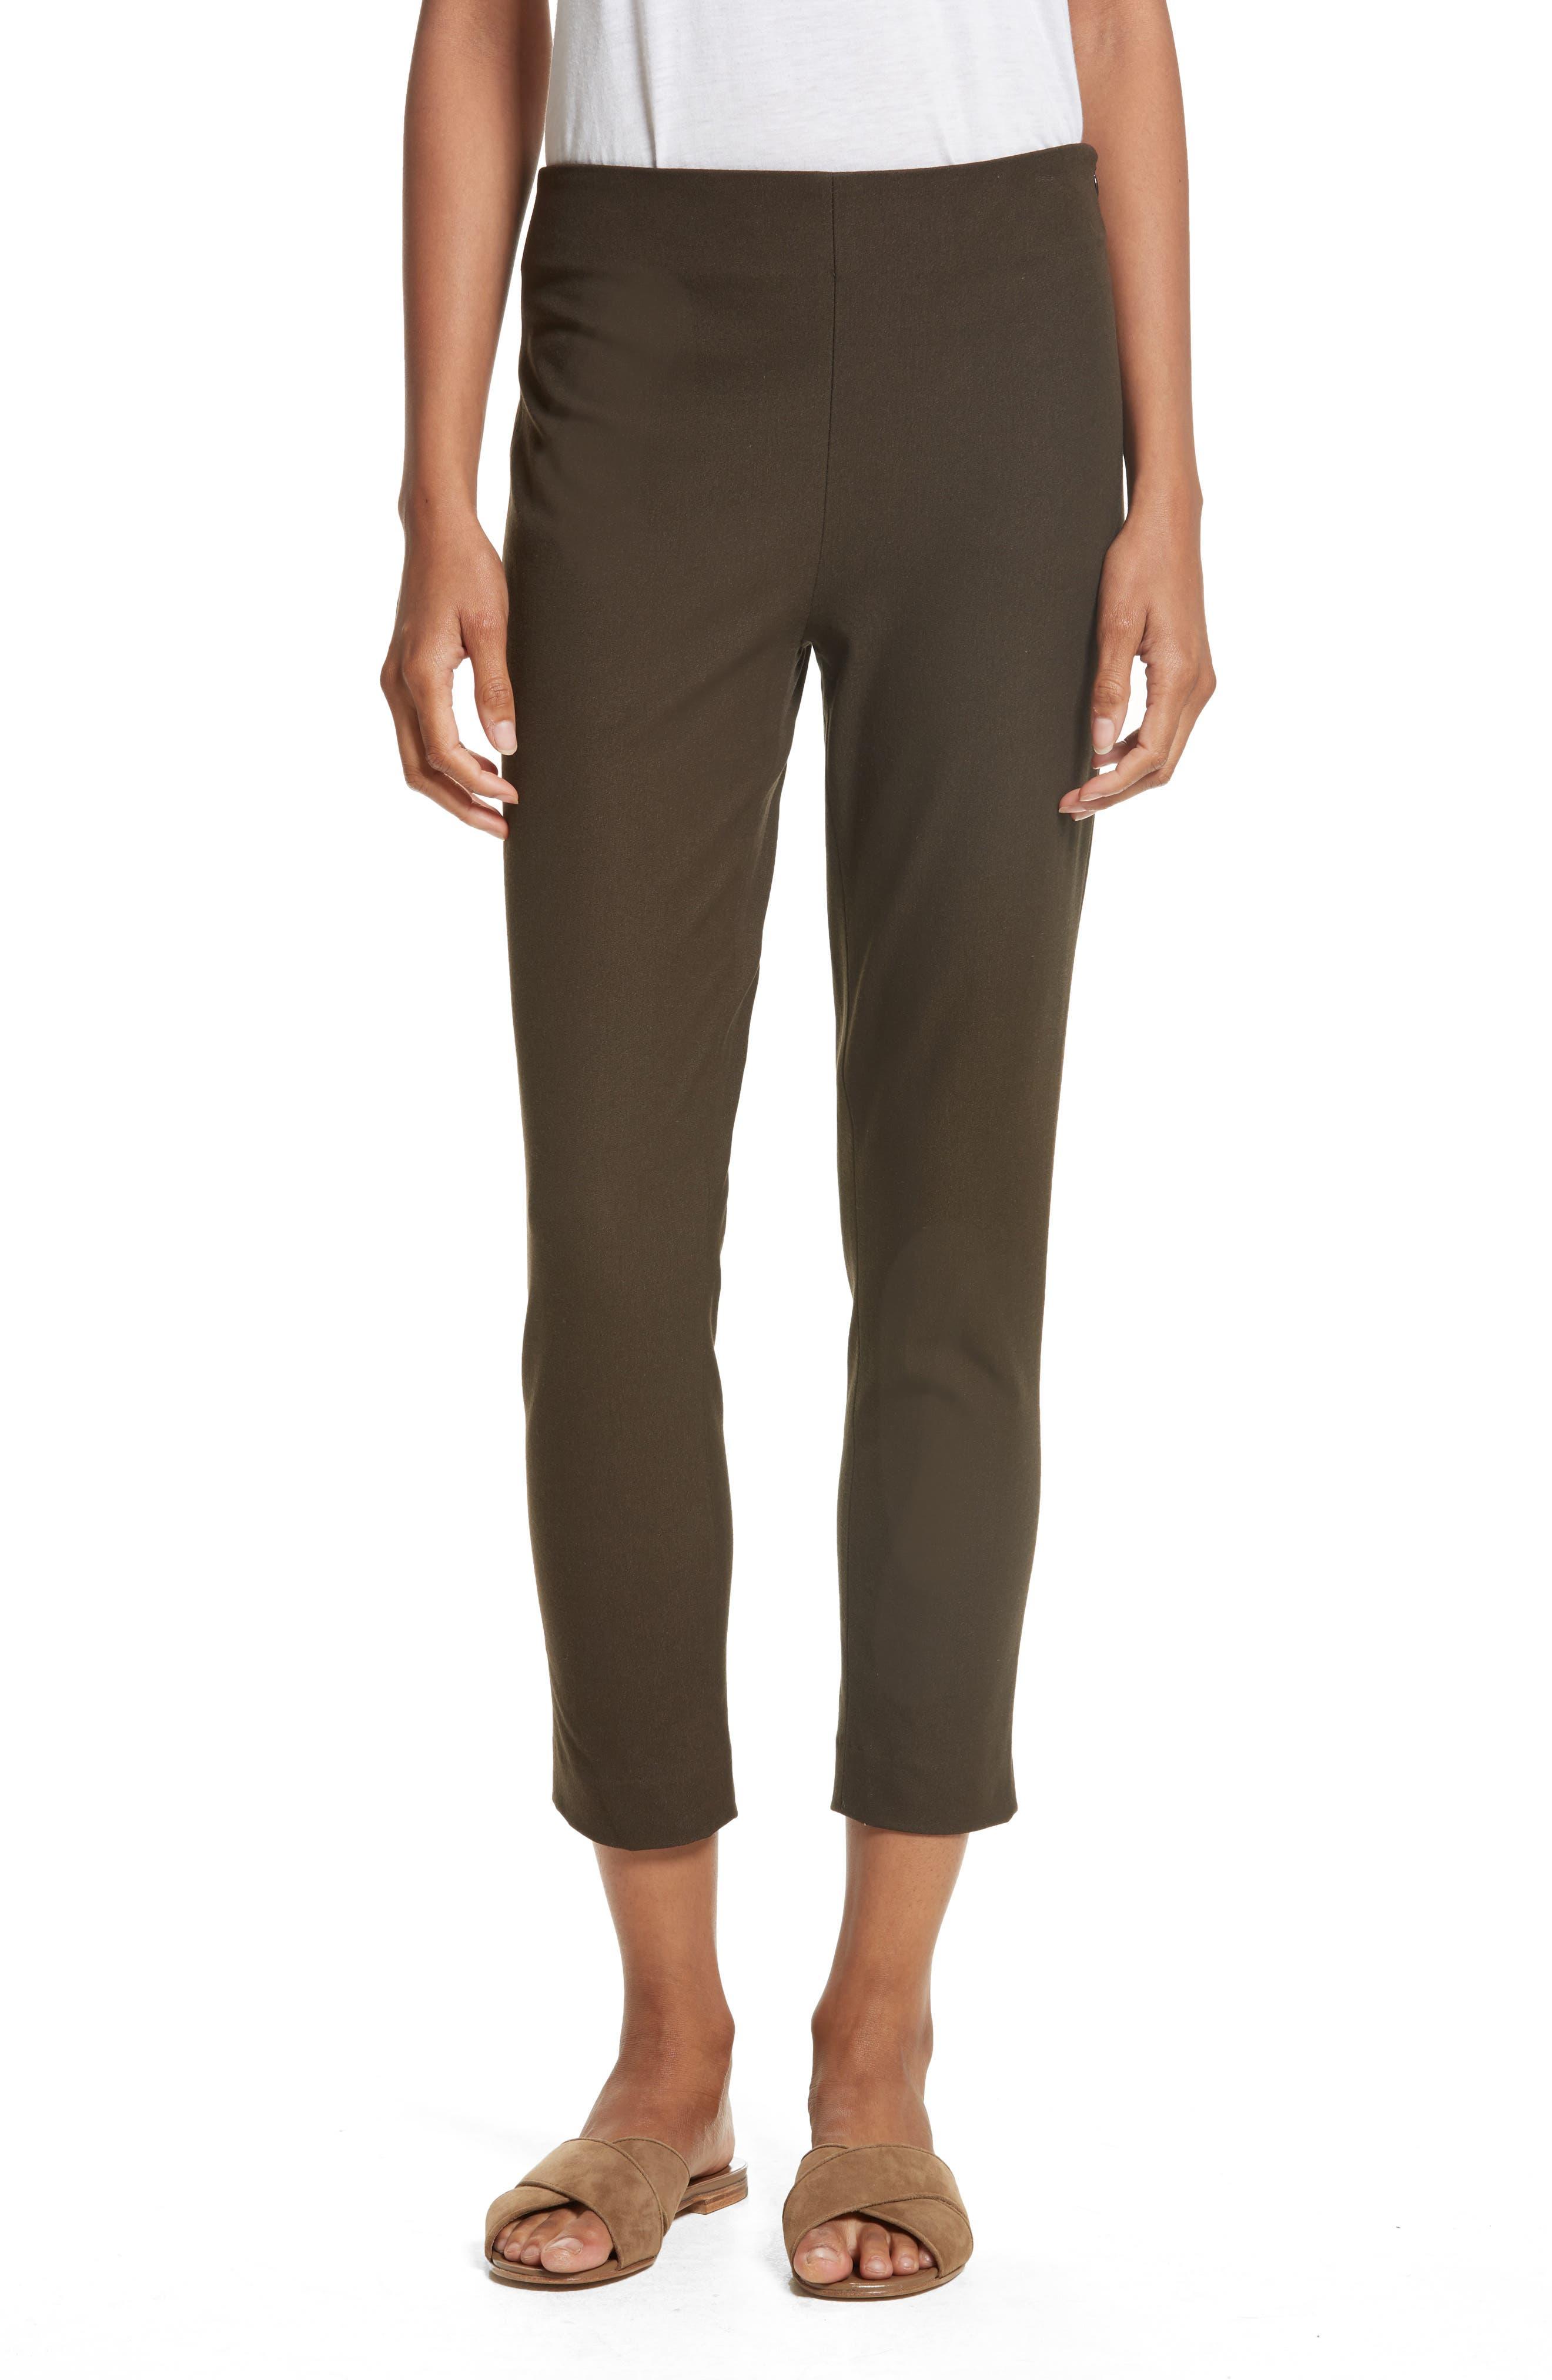 New Tony Gabardine Crop Pants,                         Main,                         color, Chocolate